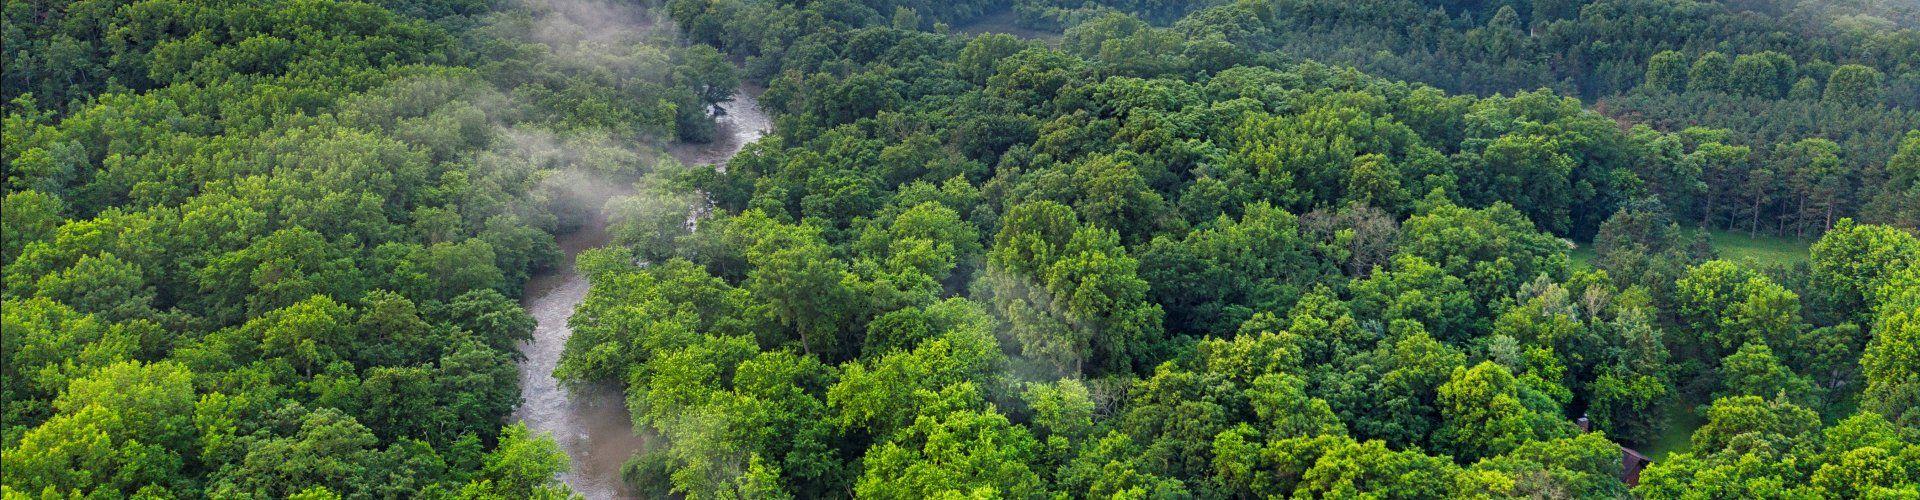 MADE-Marketing-trees-for-all-groen-werken-groene-online-marketing